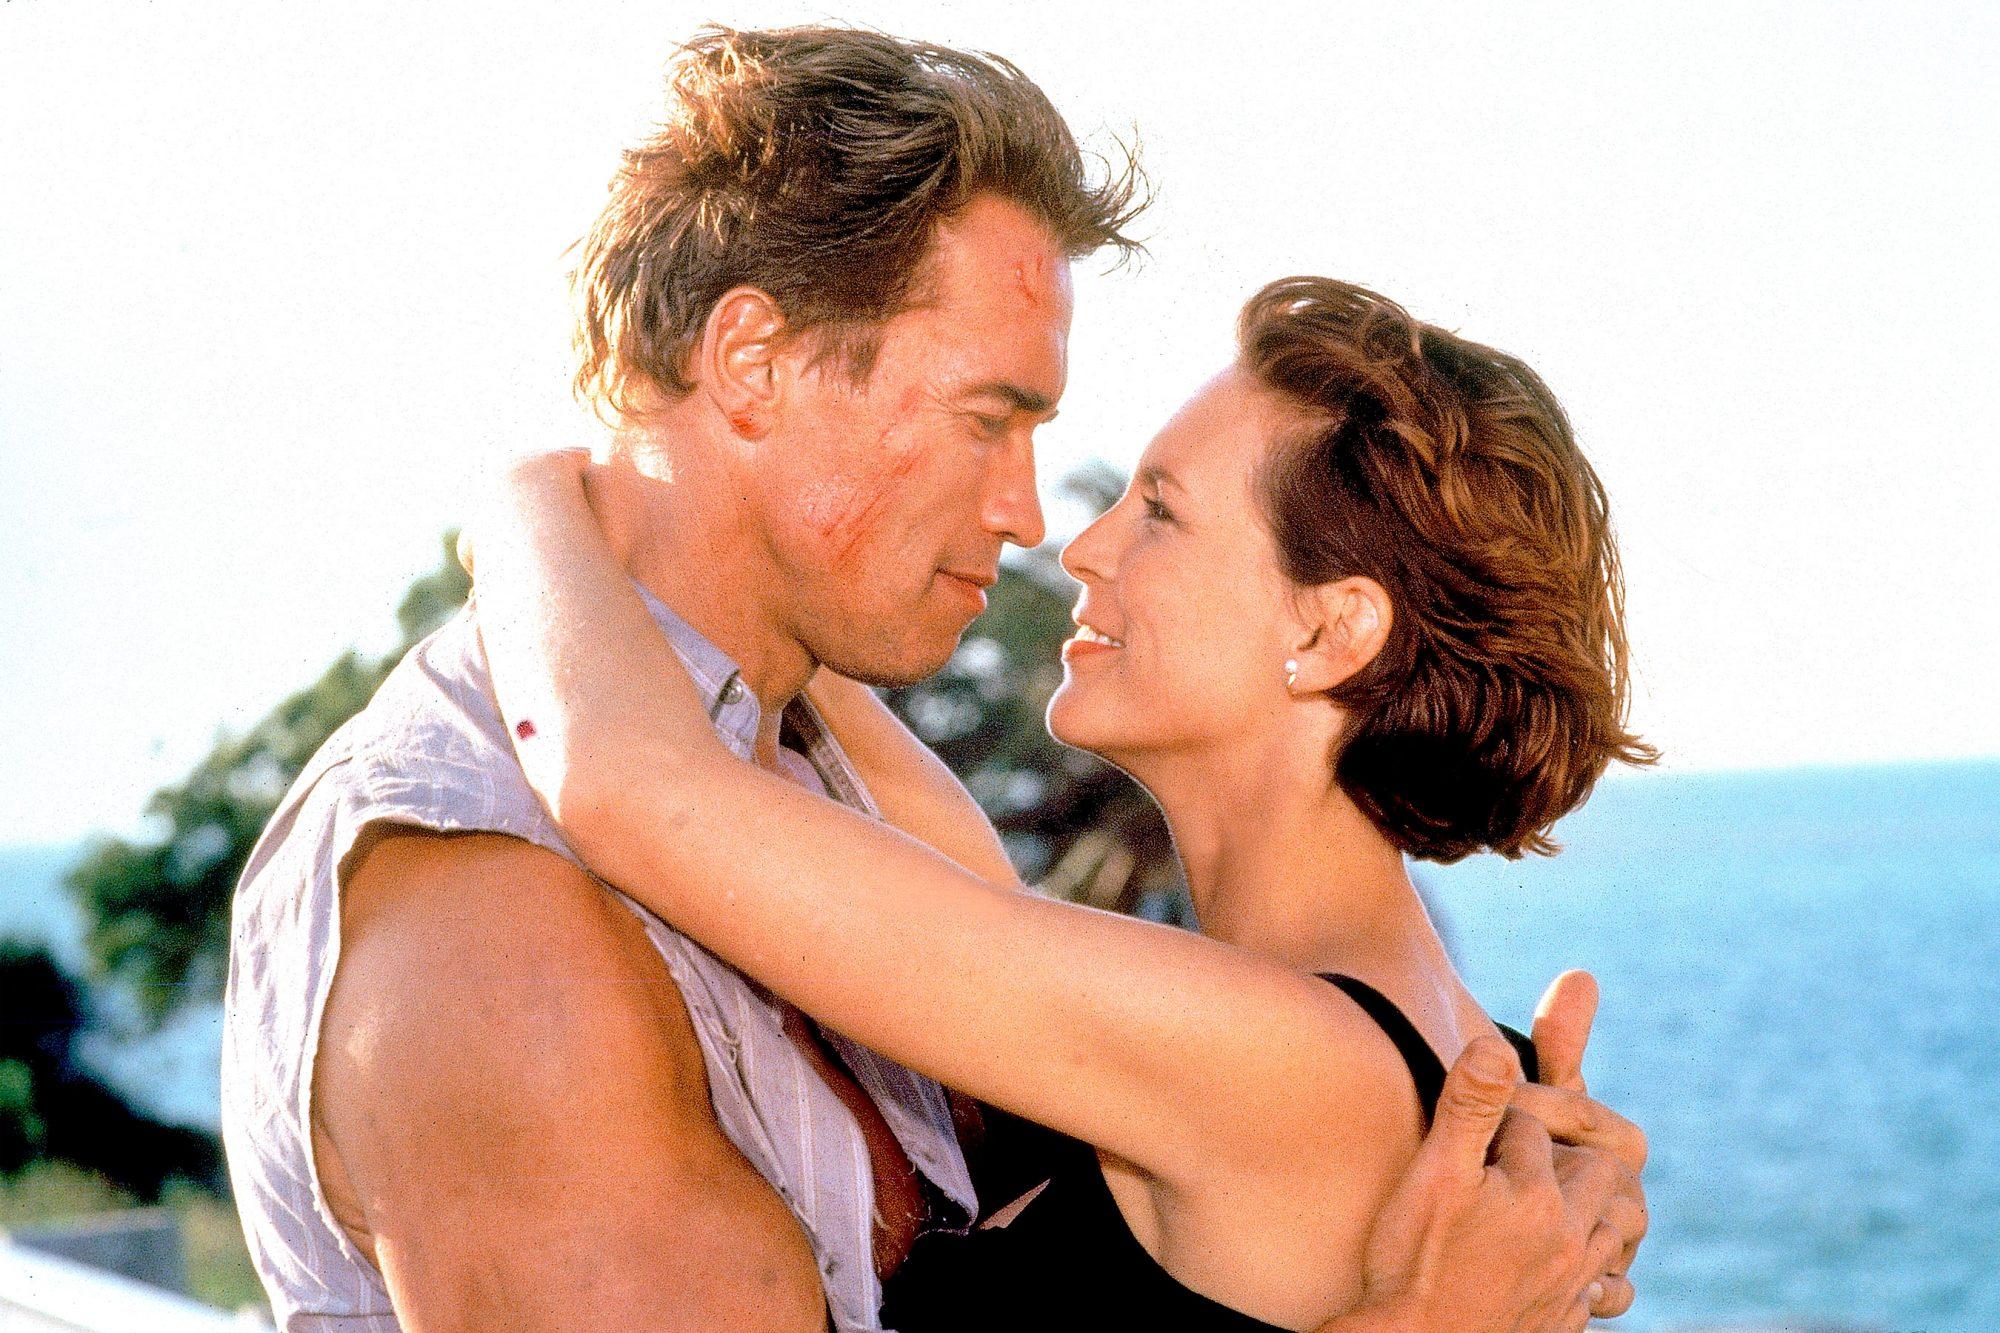 True Lies All Arnold Schwarzenegger Action Movies, Ranked